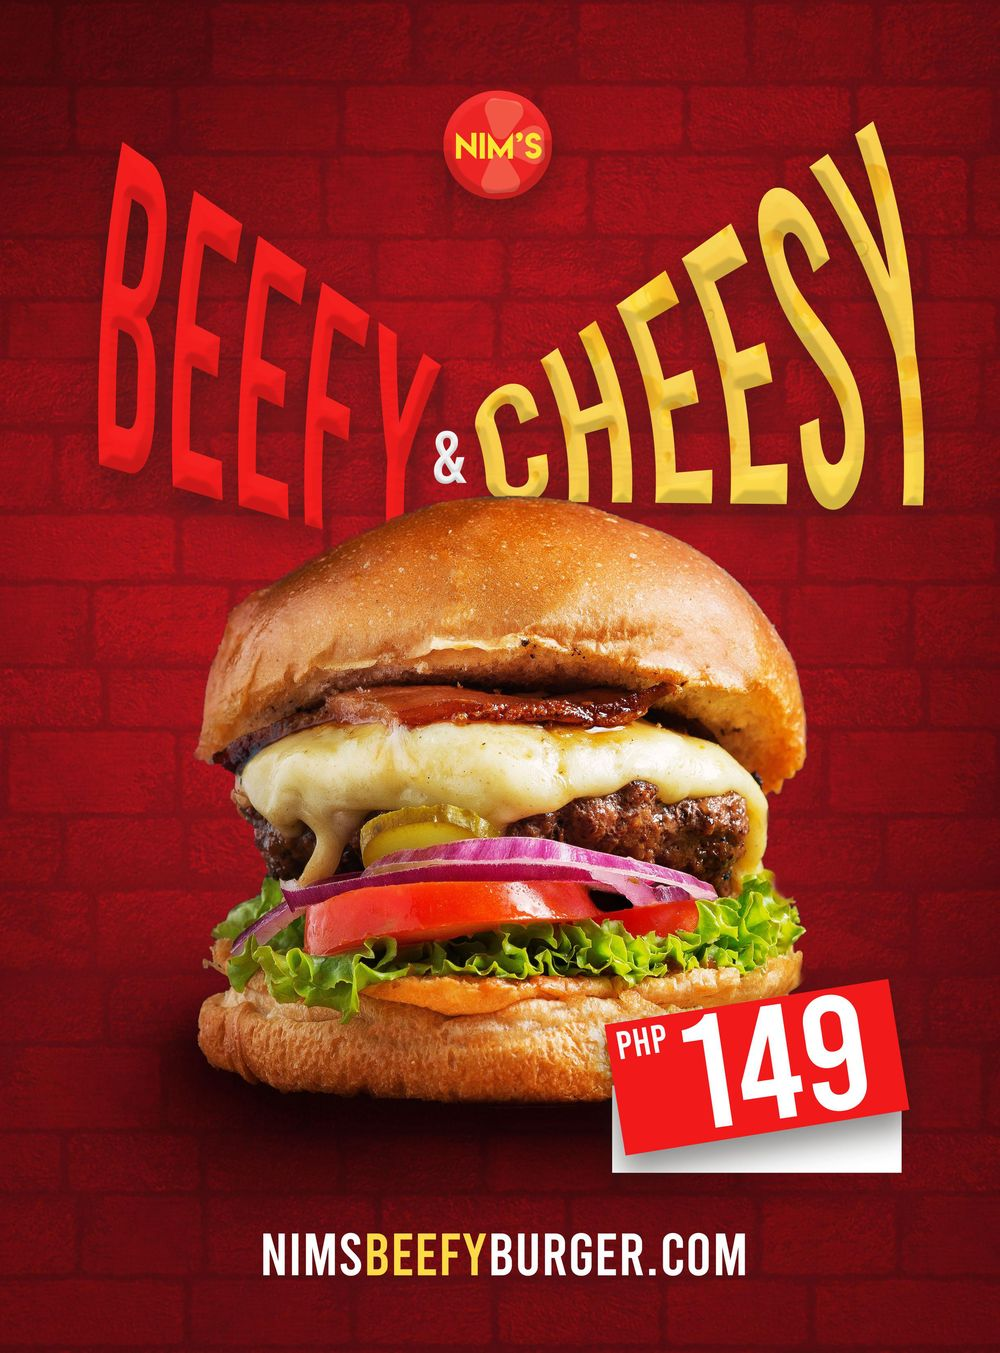 Hamburger Ad :) - image 1 - student project